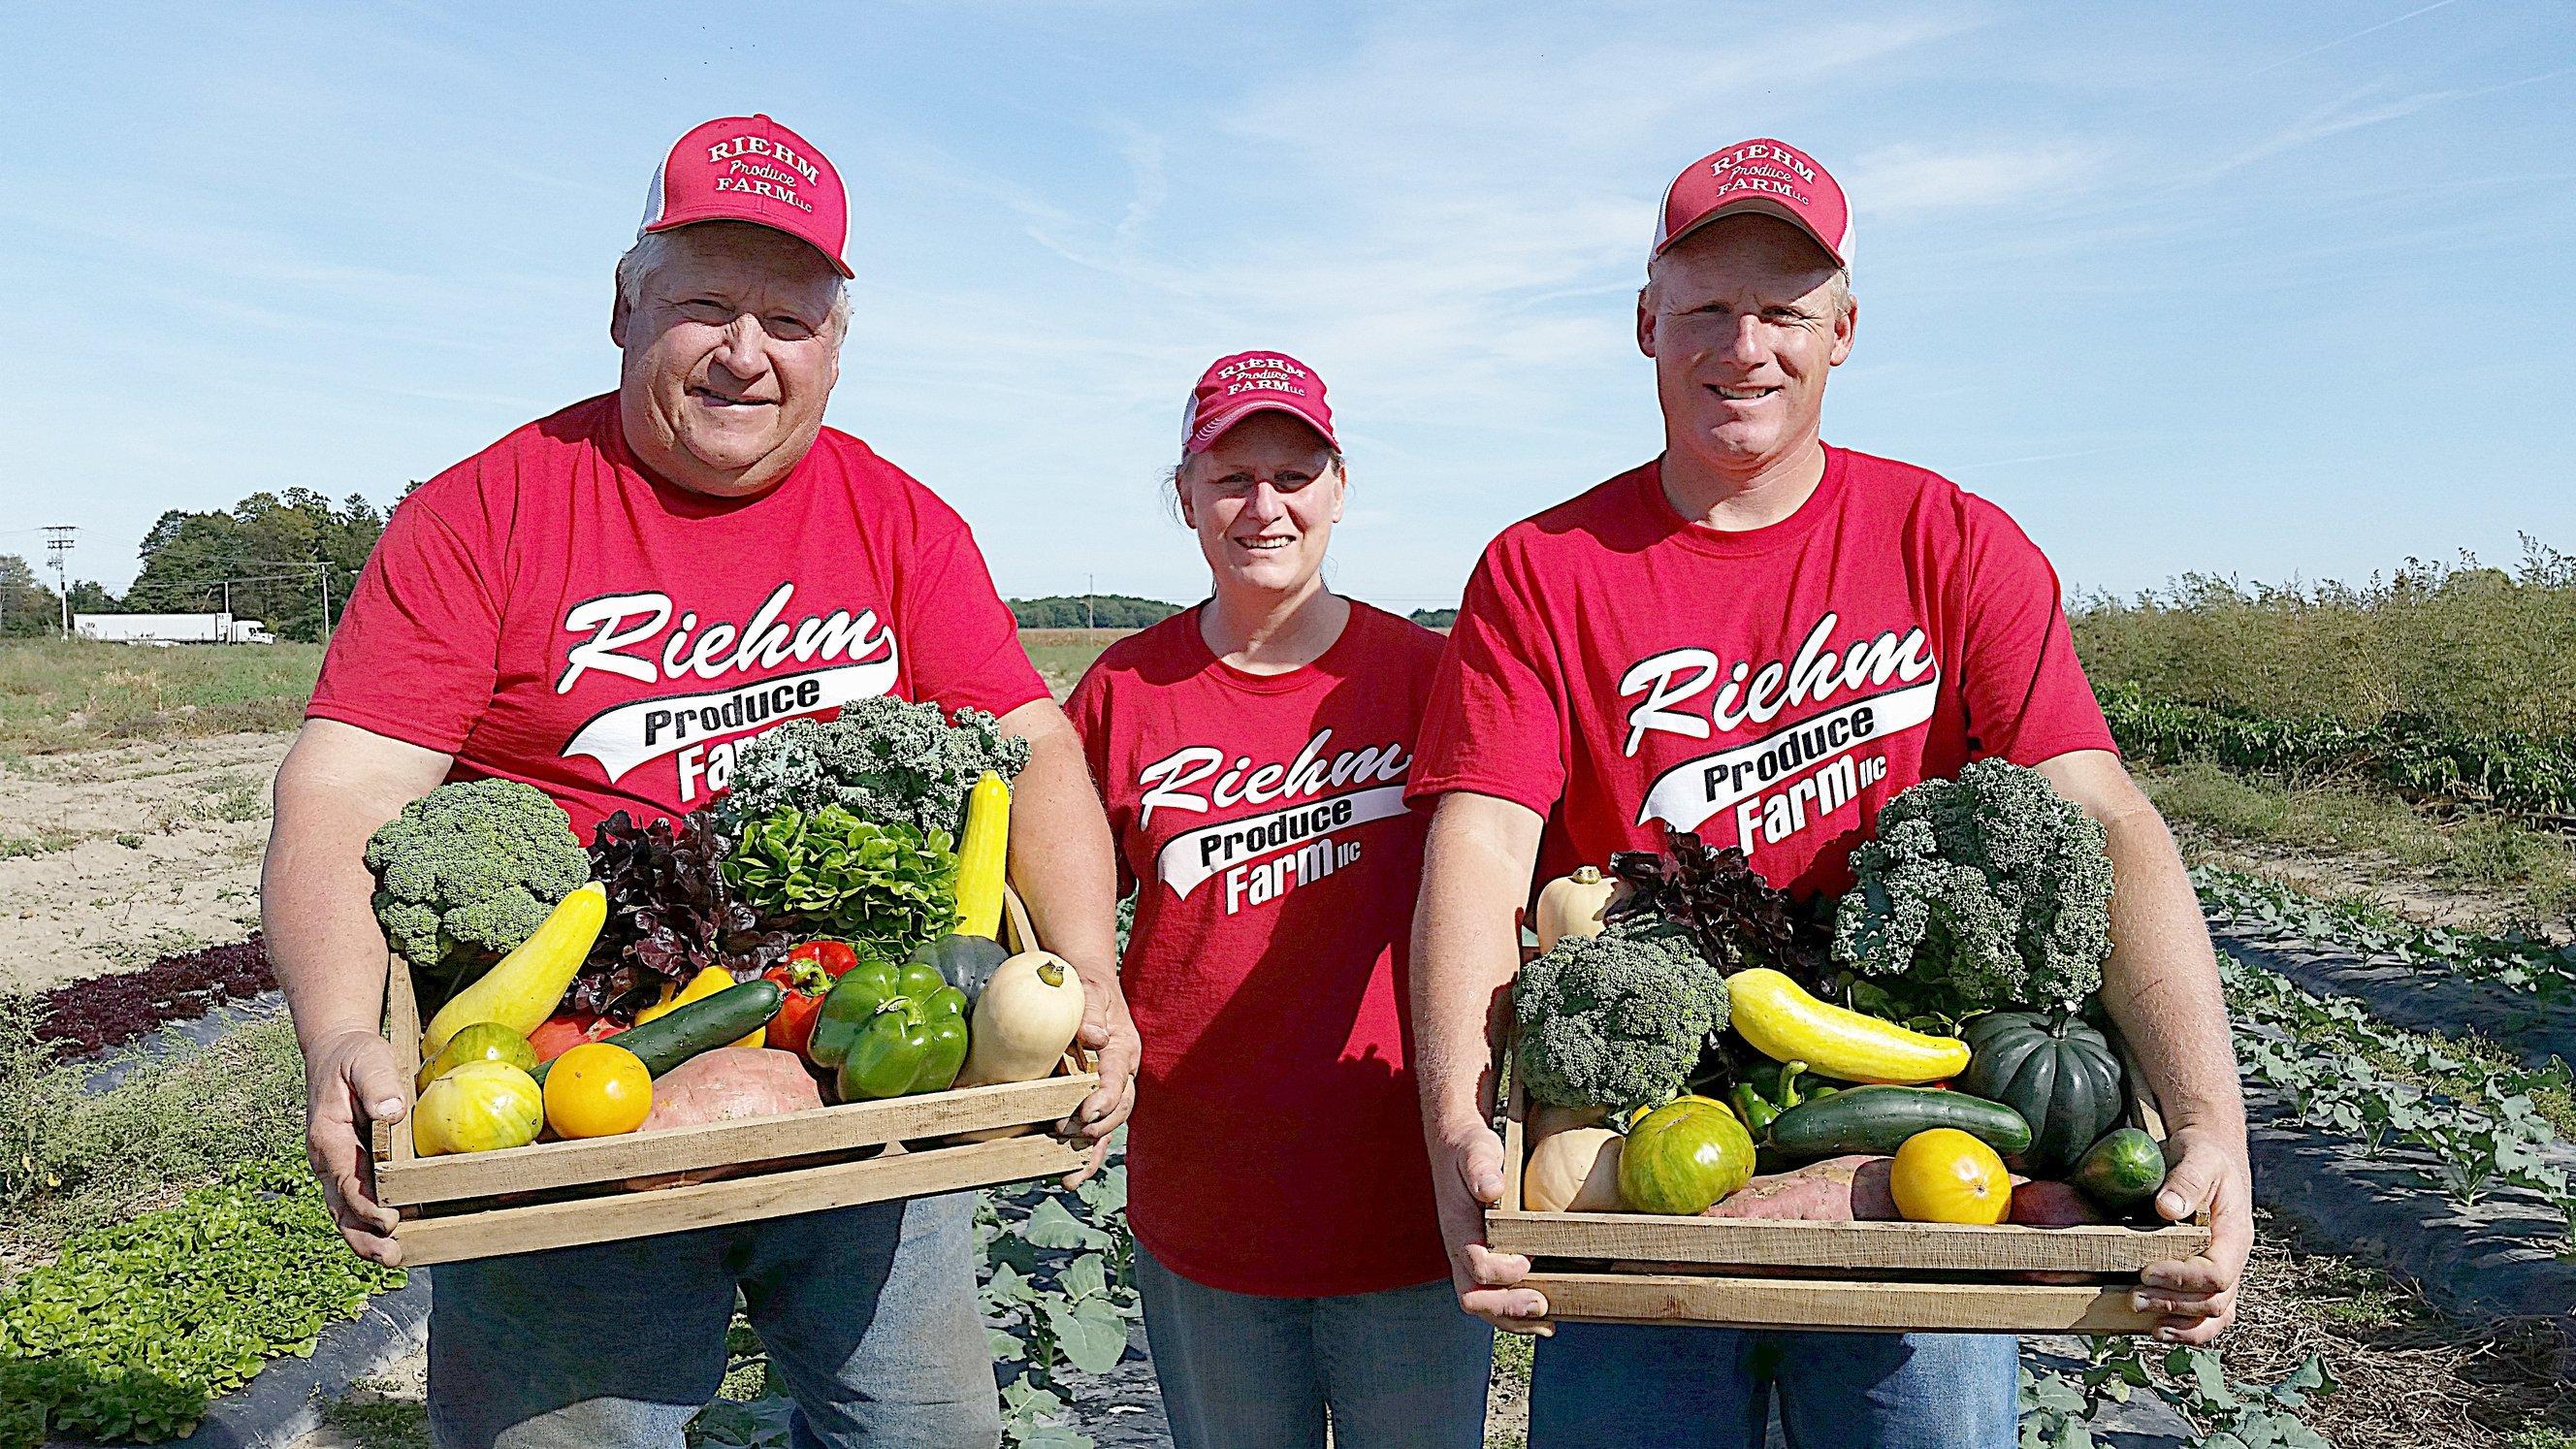 Riehm's Farm Happenings (Week 20, last for the Summer)